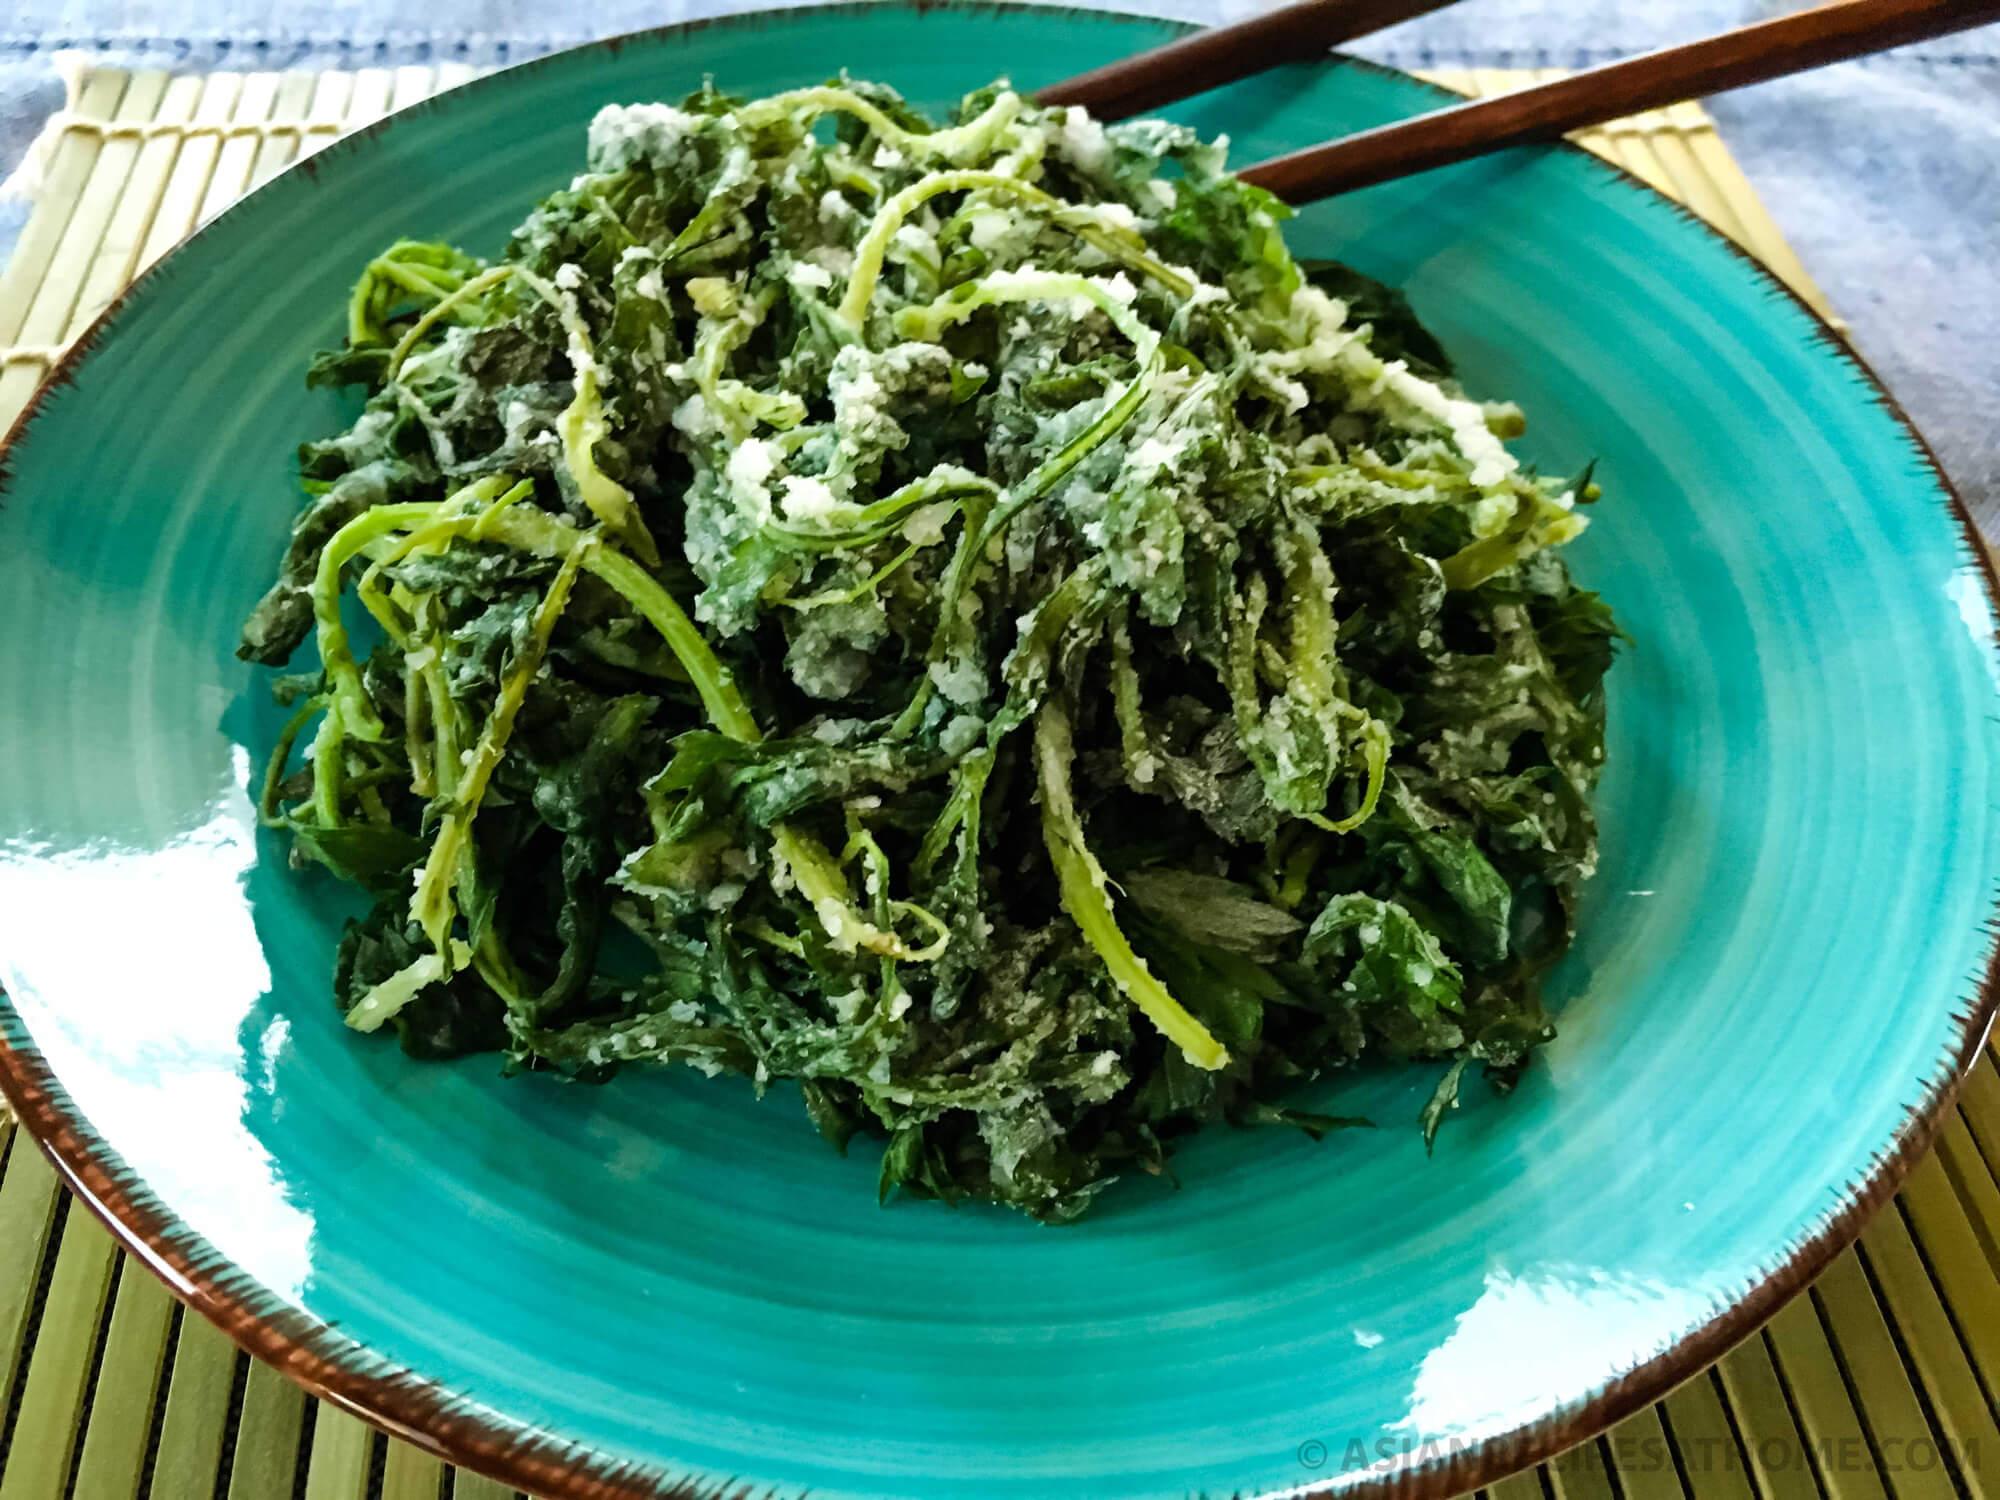 Korean wild mugwort greens (ssuk) ready to eat.